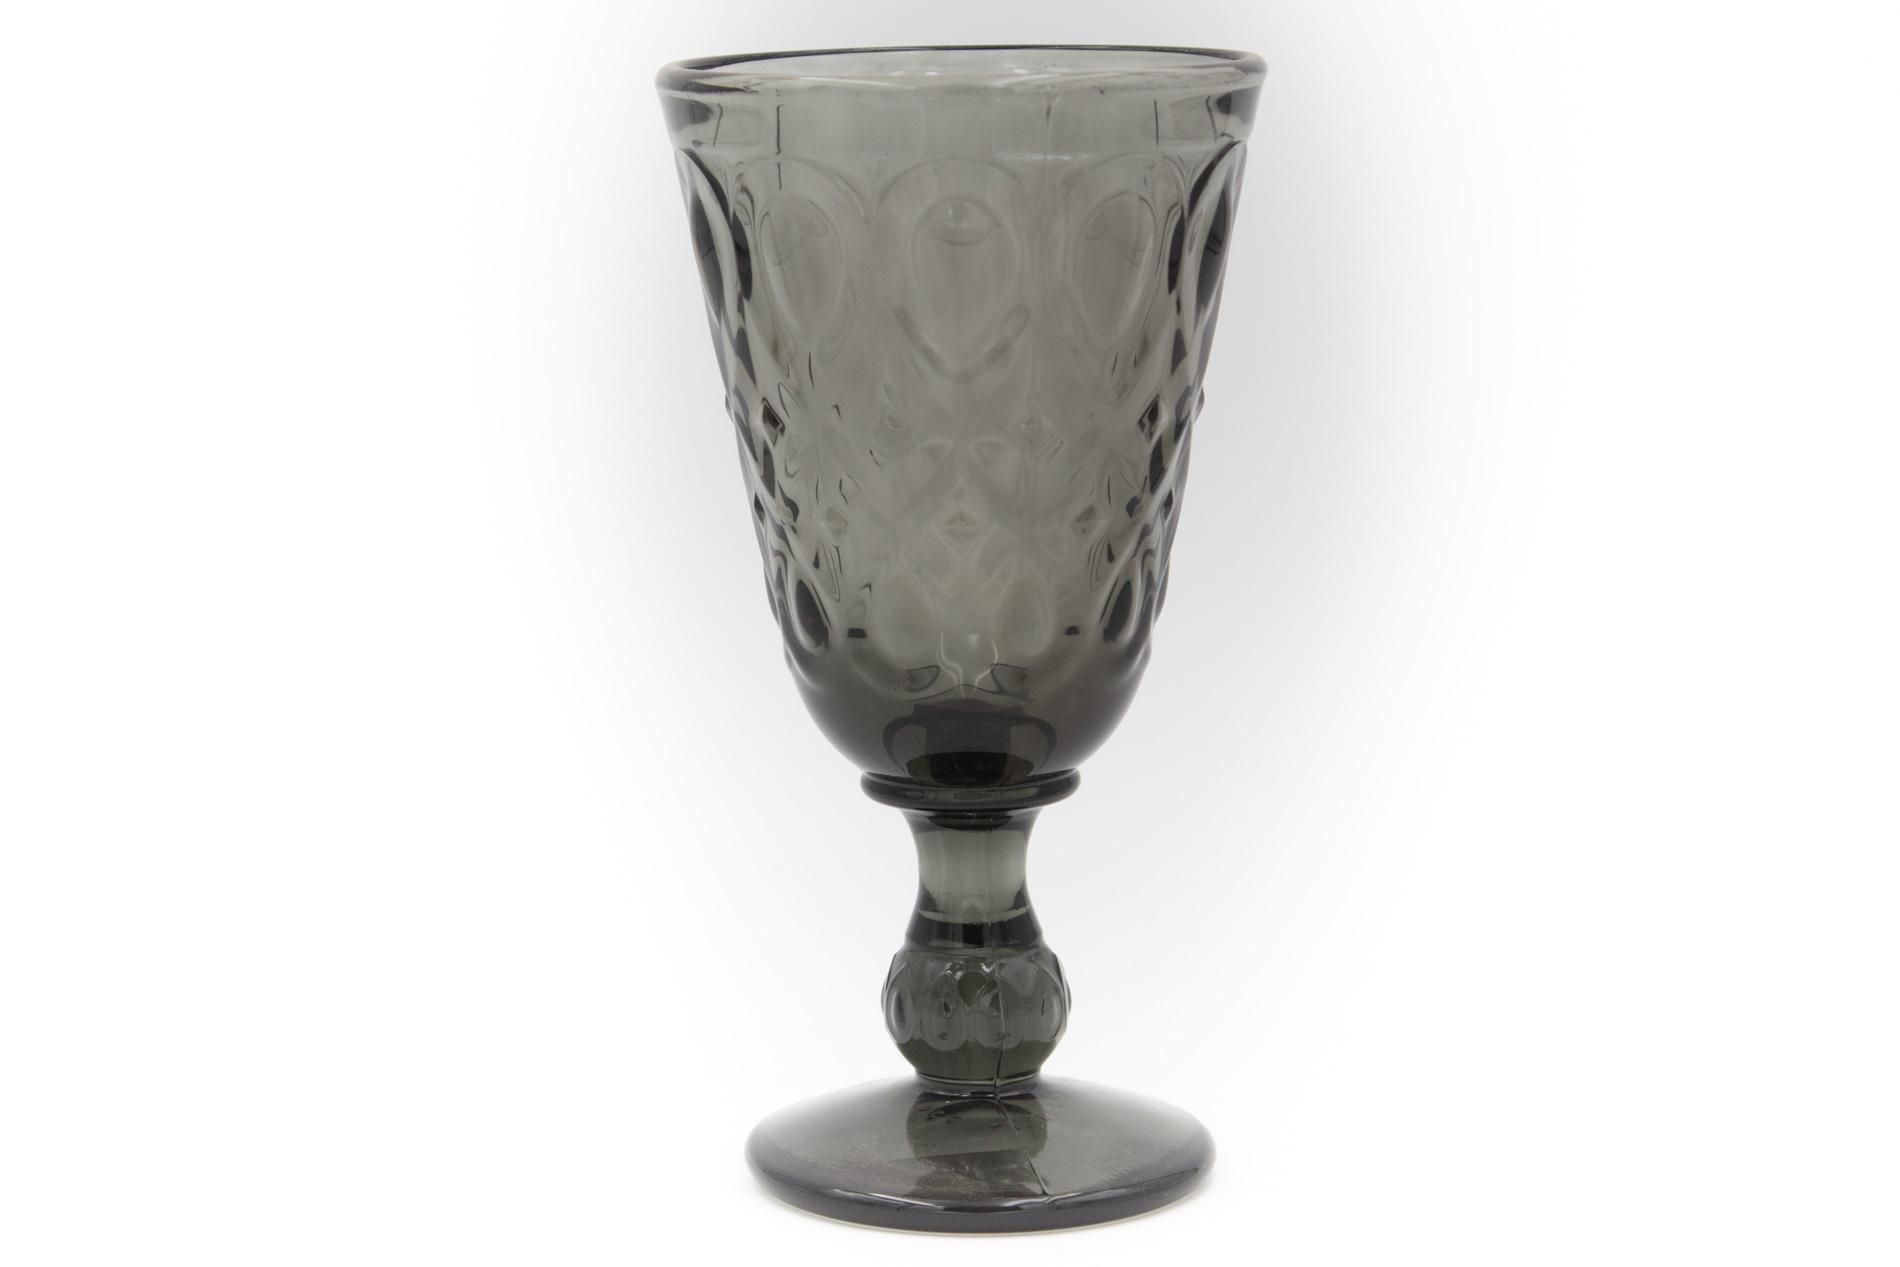 Weinglas schwarz Lyon, 0,2 l